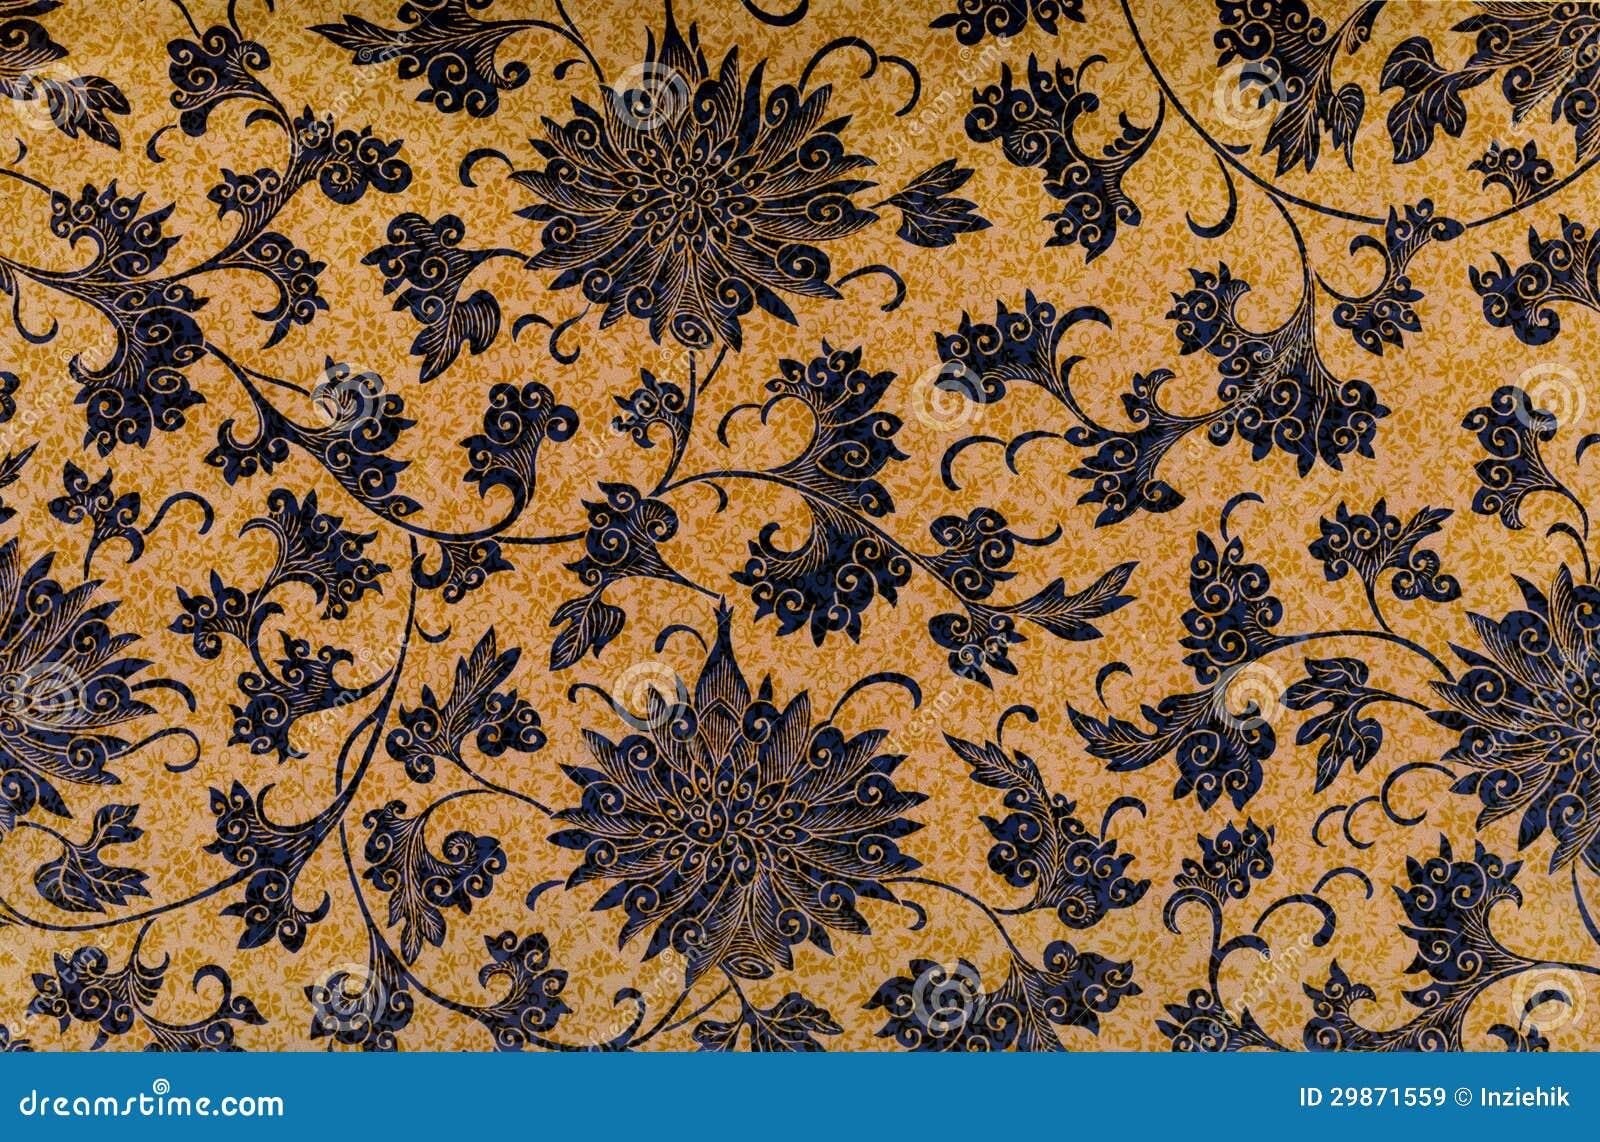 Batik design royalty free stock photos image 29546988 - Royalty Free Stock Photo